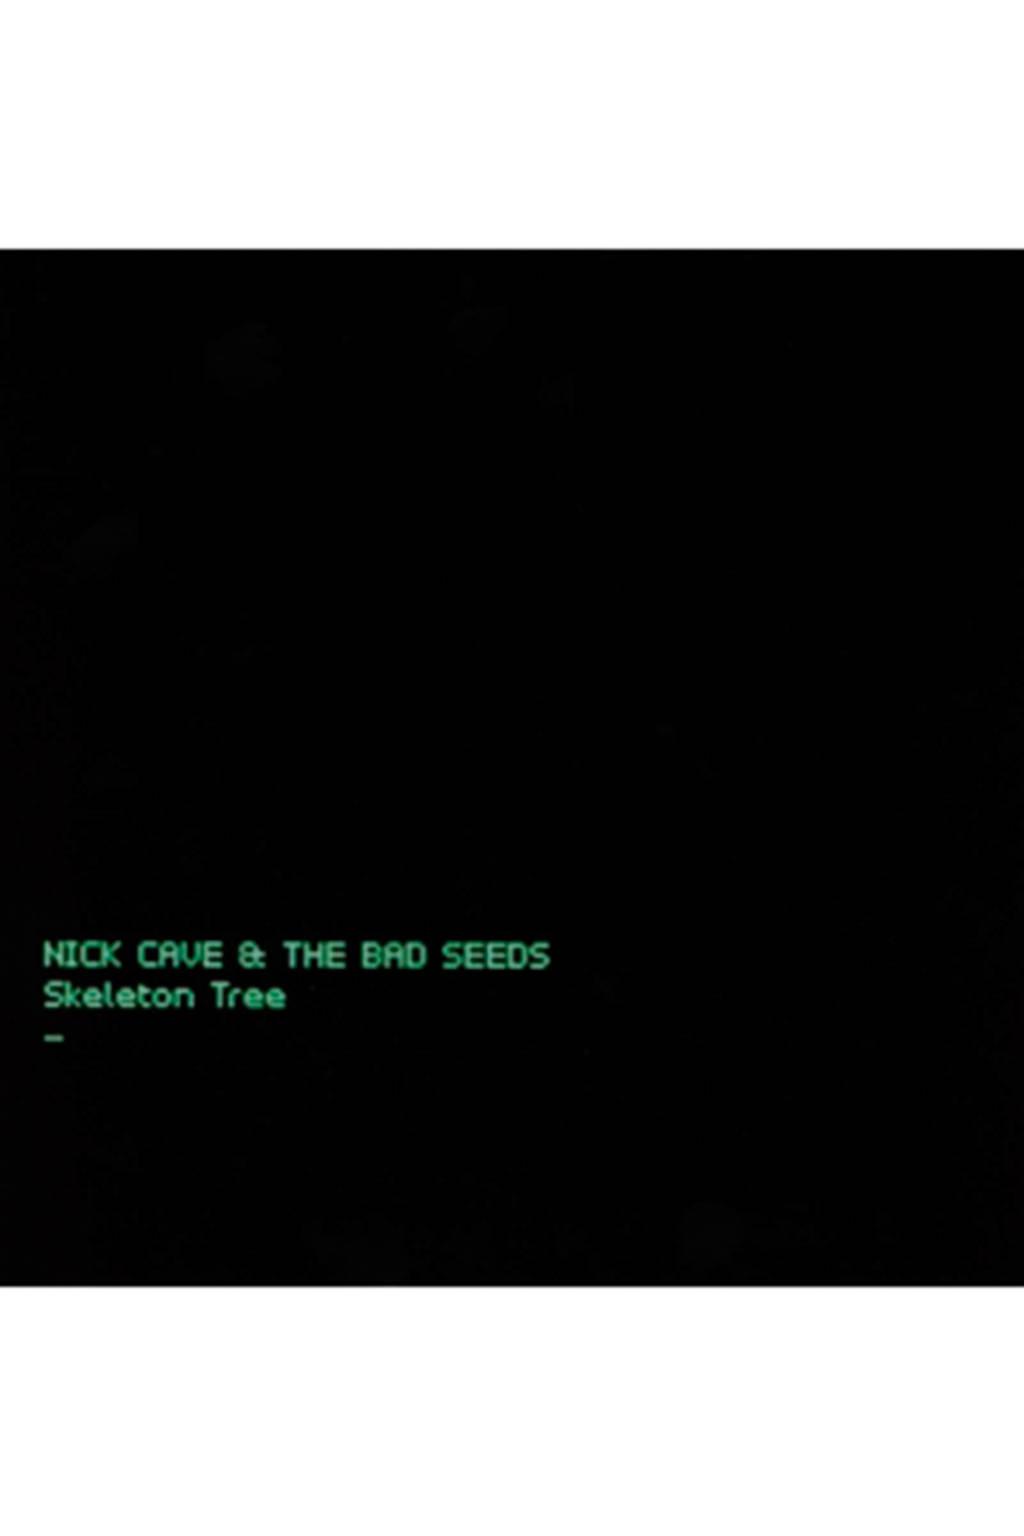 Nick Cave & The Bad Seeds - Skeleton Tree (CD)